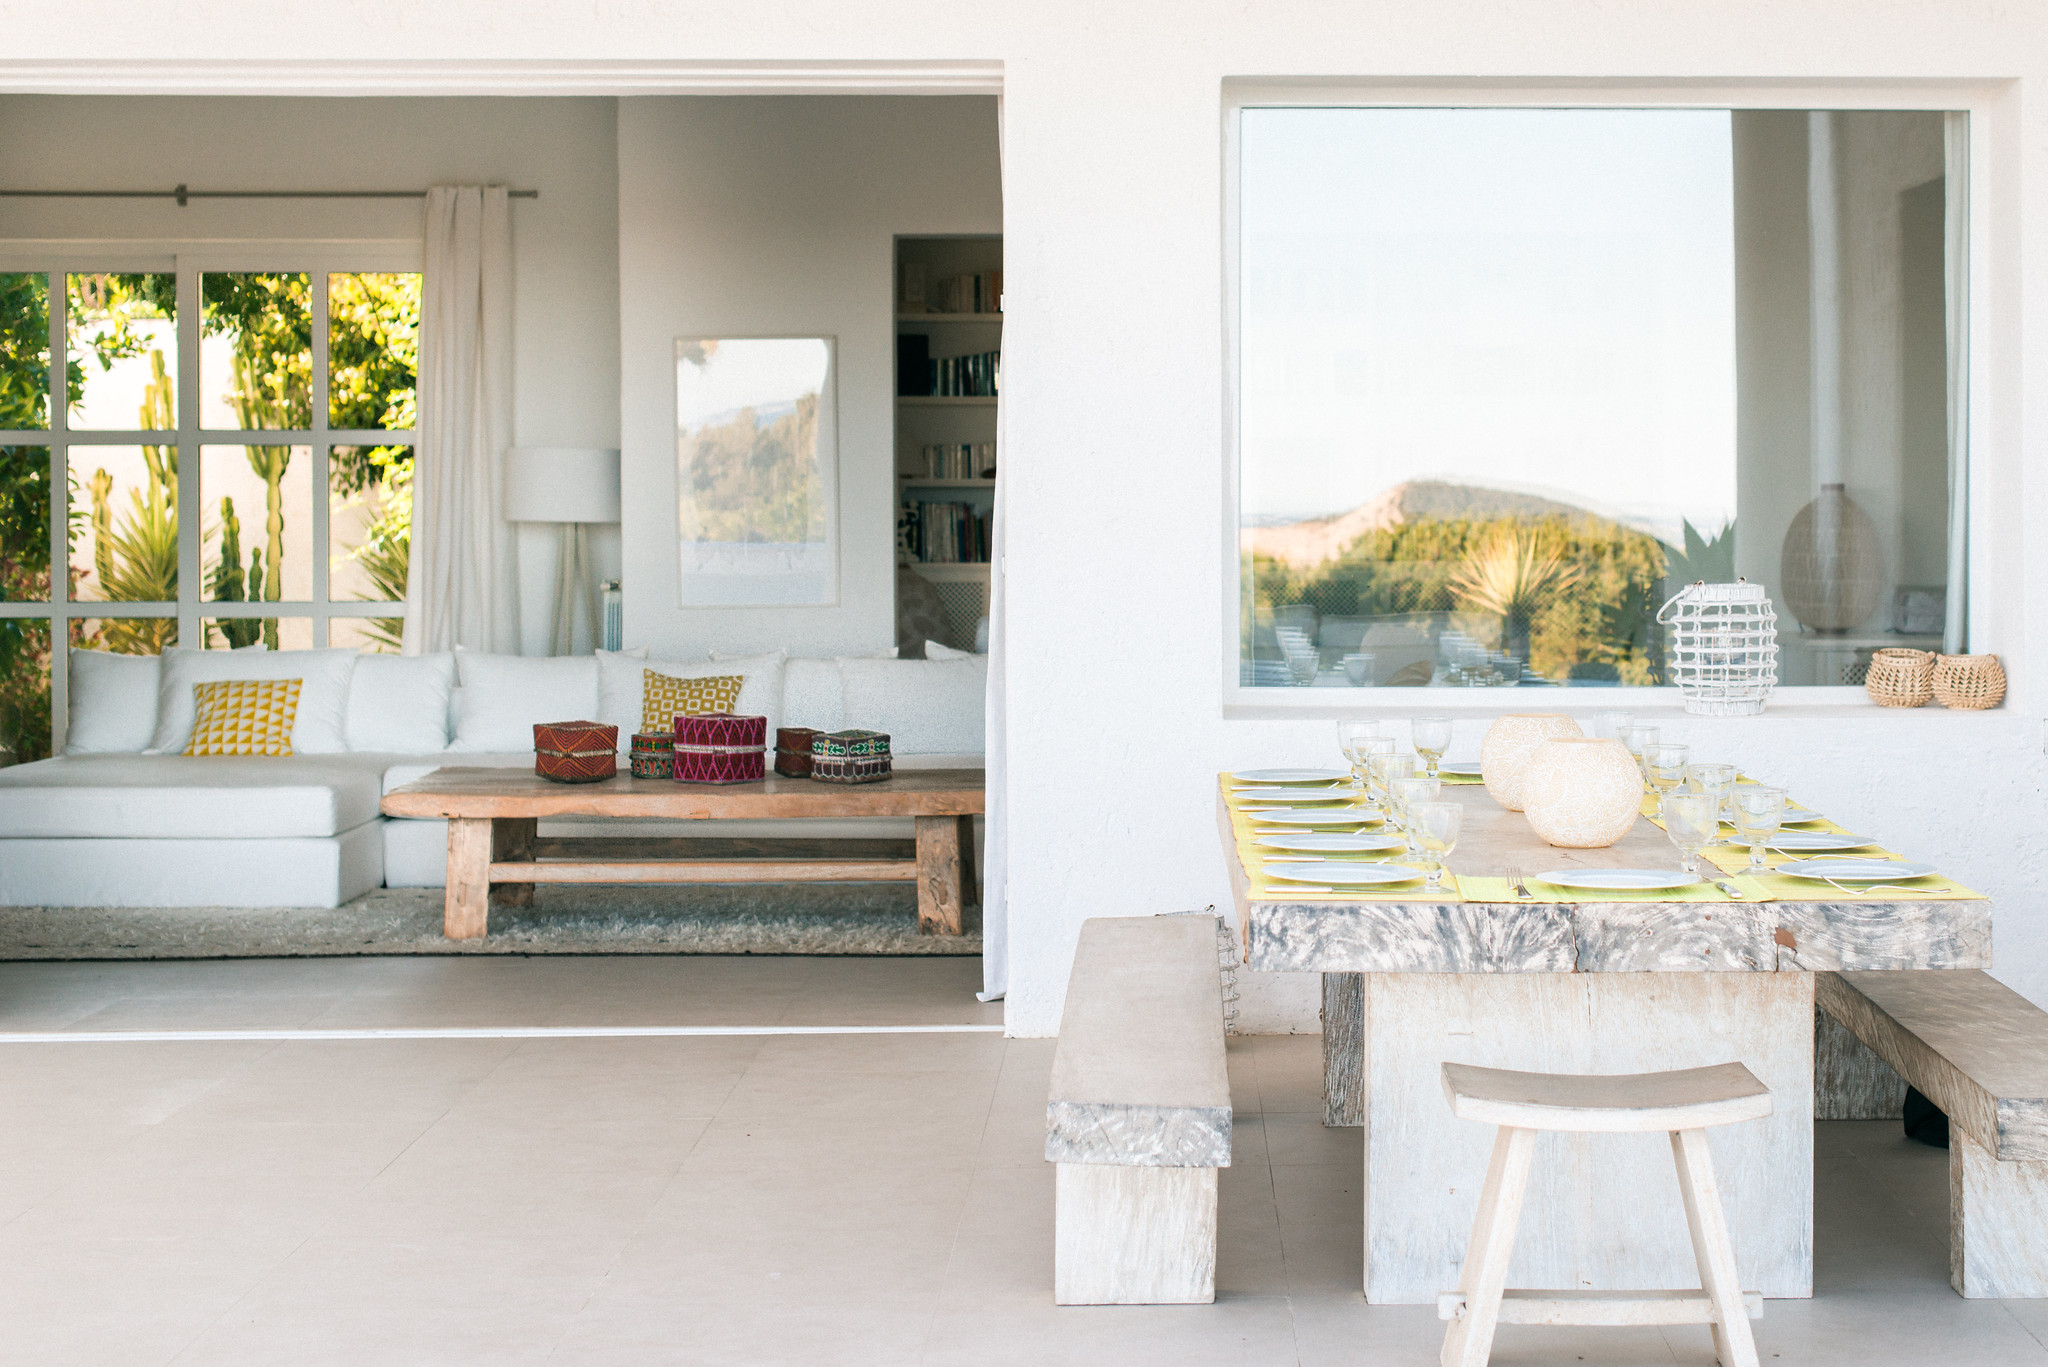 https://www.white-ibiza.com/wp-content/uploads/2020/06/white-ibiza-villas-casa-odette-exterior-terrace-dining.jpg